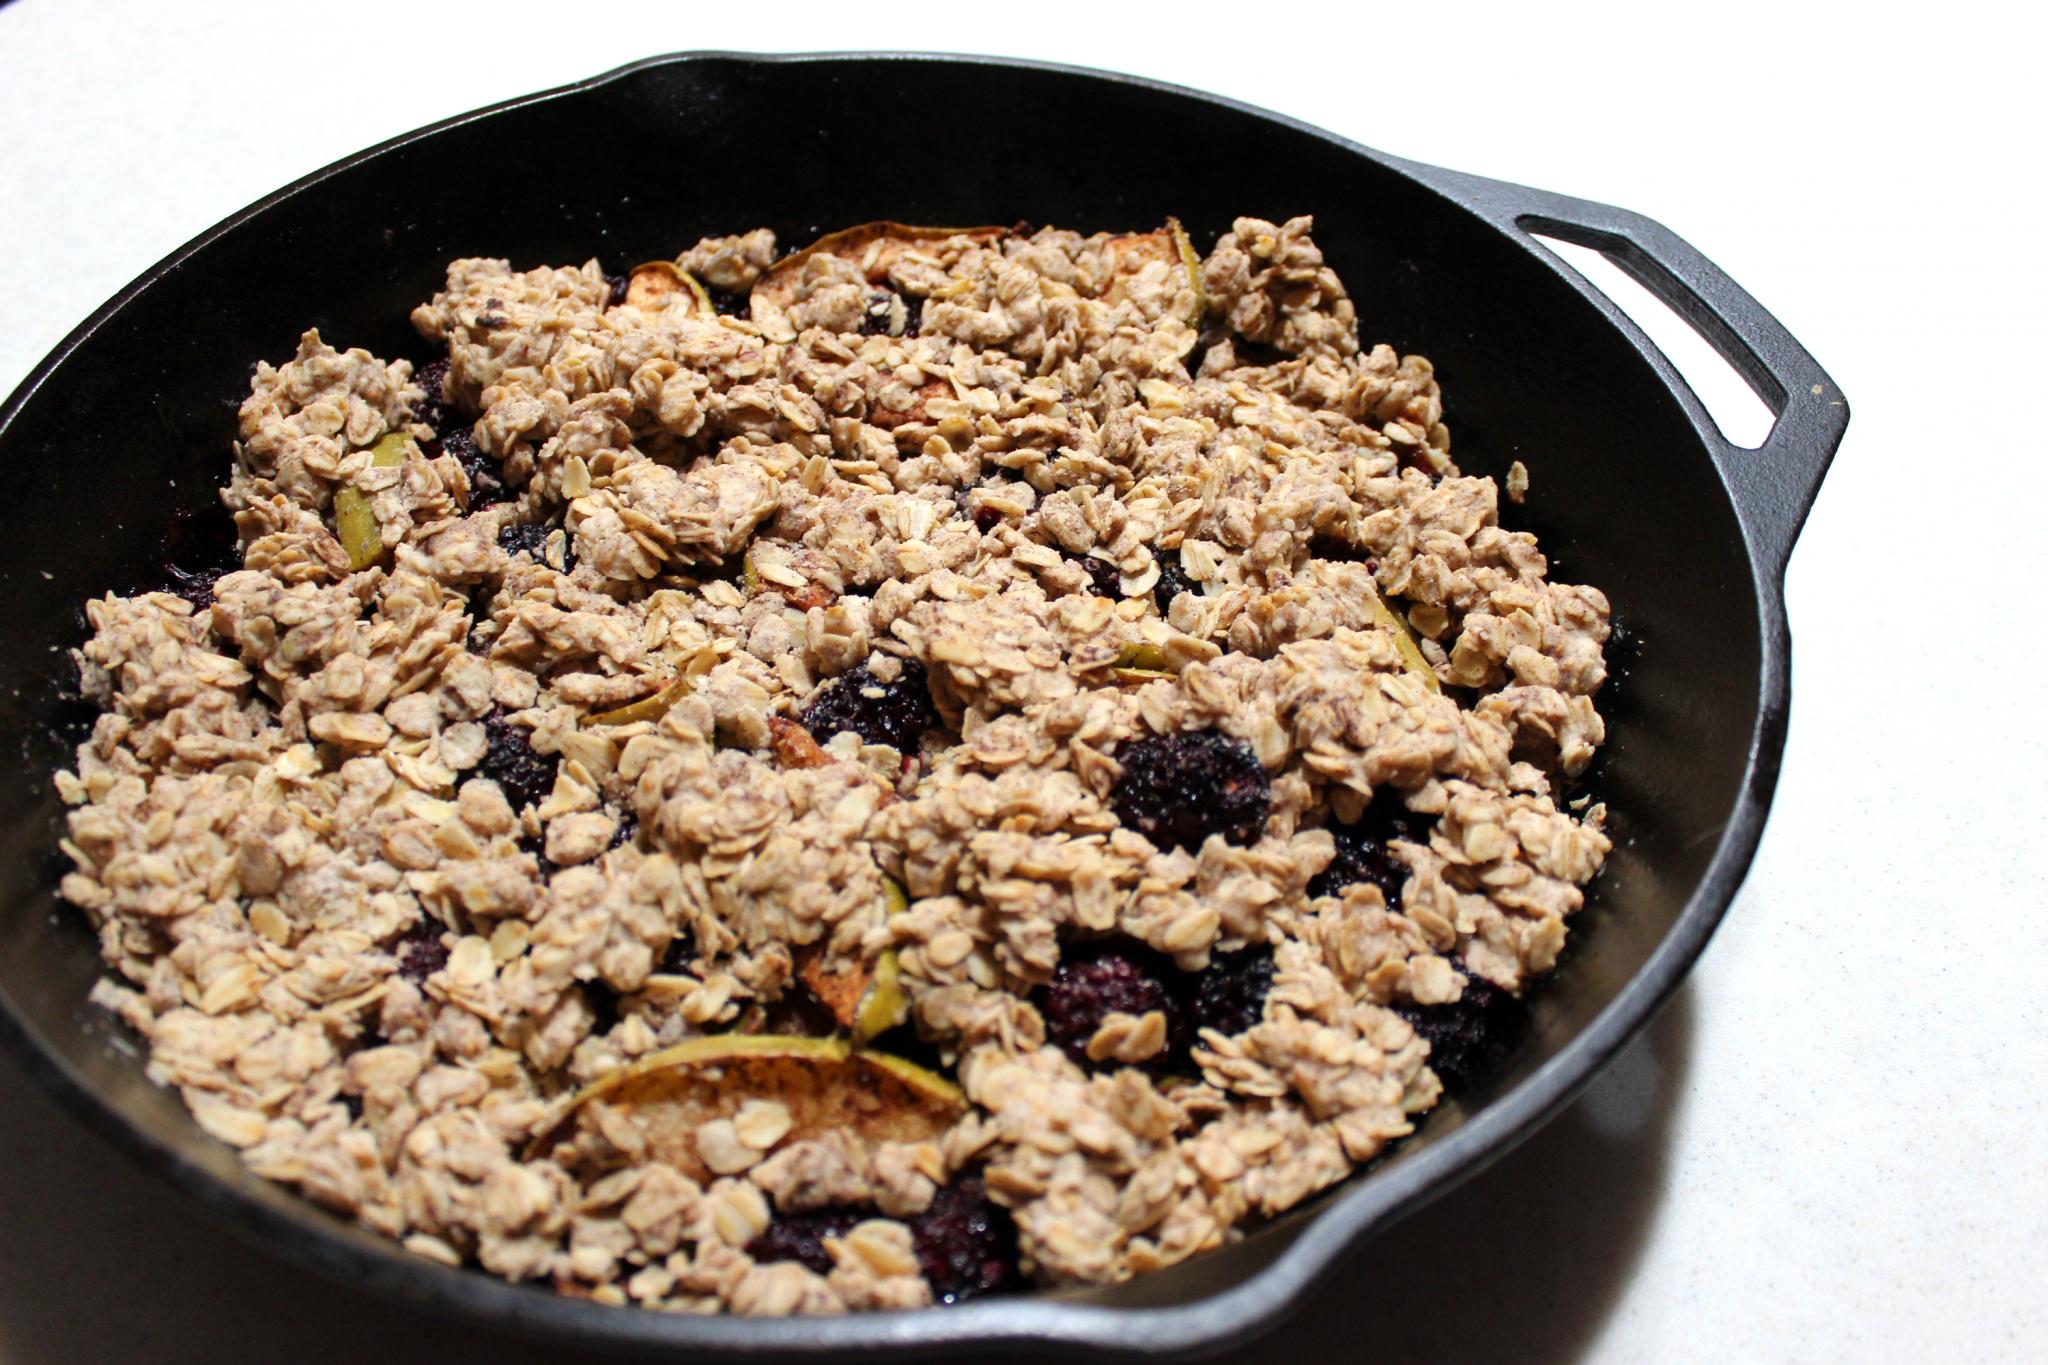 oats, apples, and blackberries in skillet